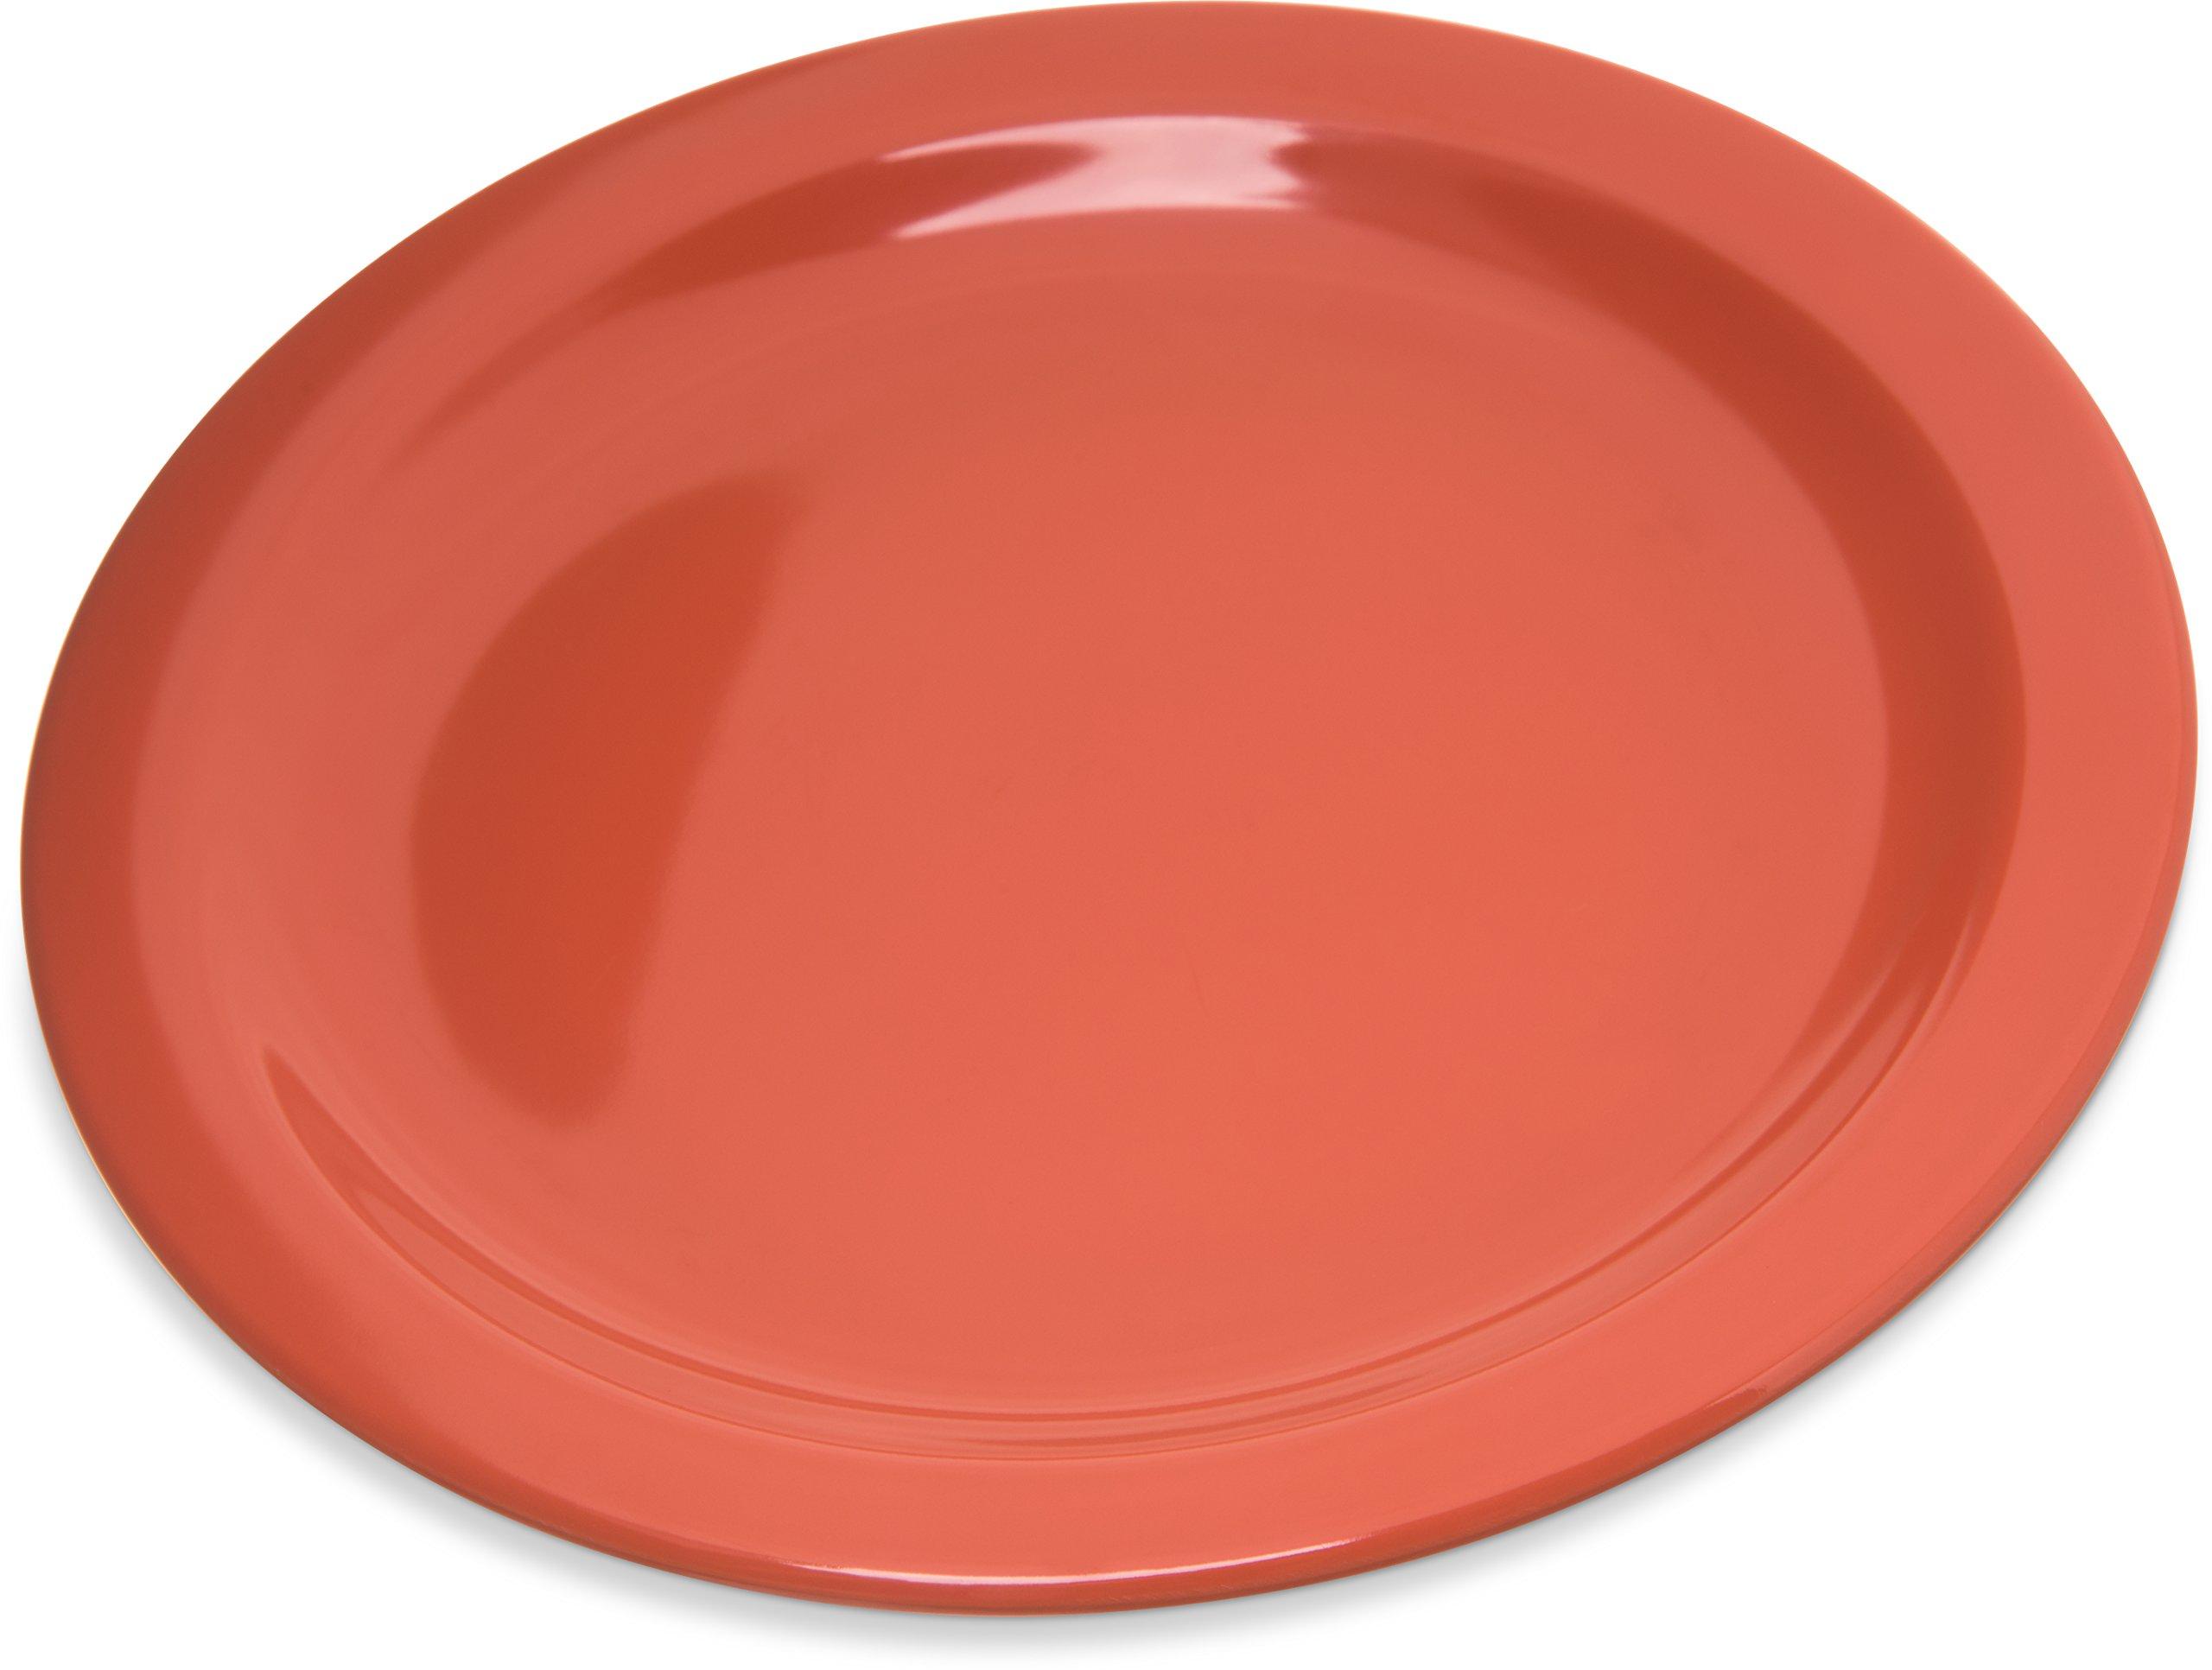 Carlisle 4350352 Dallas Ware Melamine Salad Plate, 7.19'' Diameter x 0.74'' Height, Sunset Orange (Case of 48)